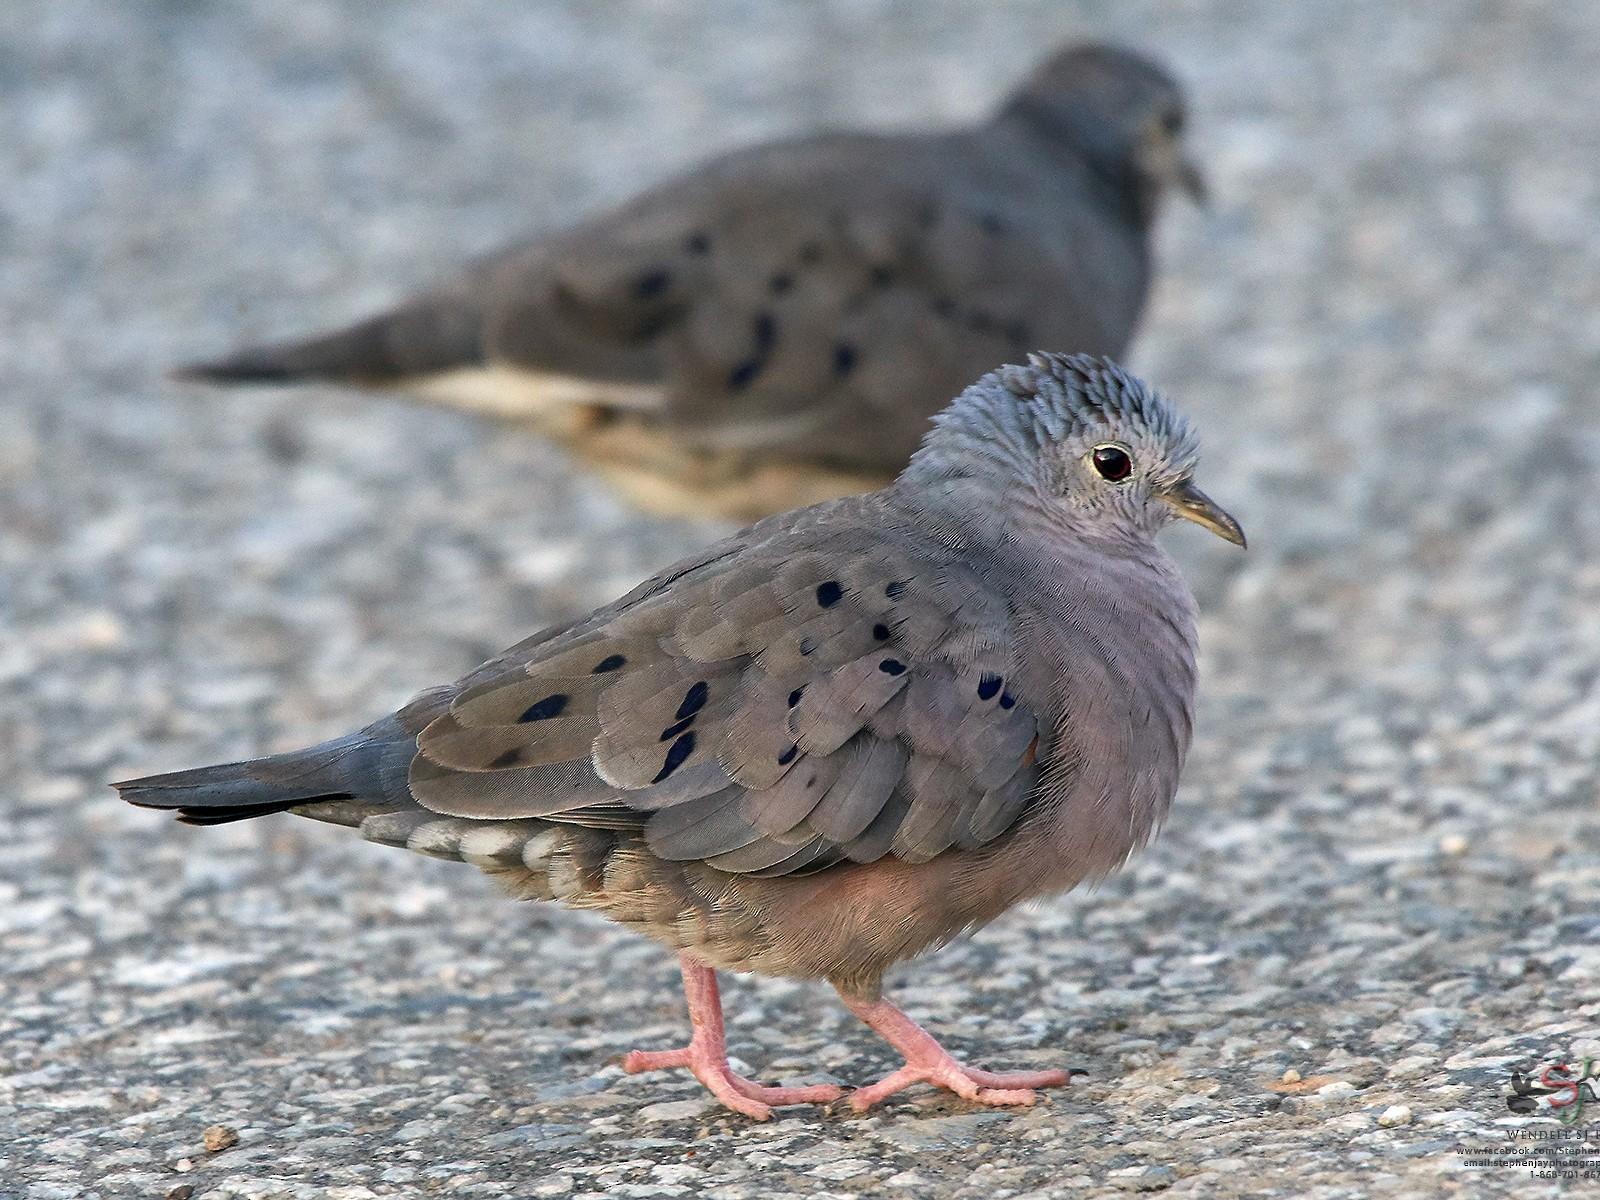 Plain-breasted Ground Dove - Wendell SJ Reyes